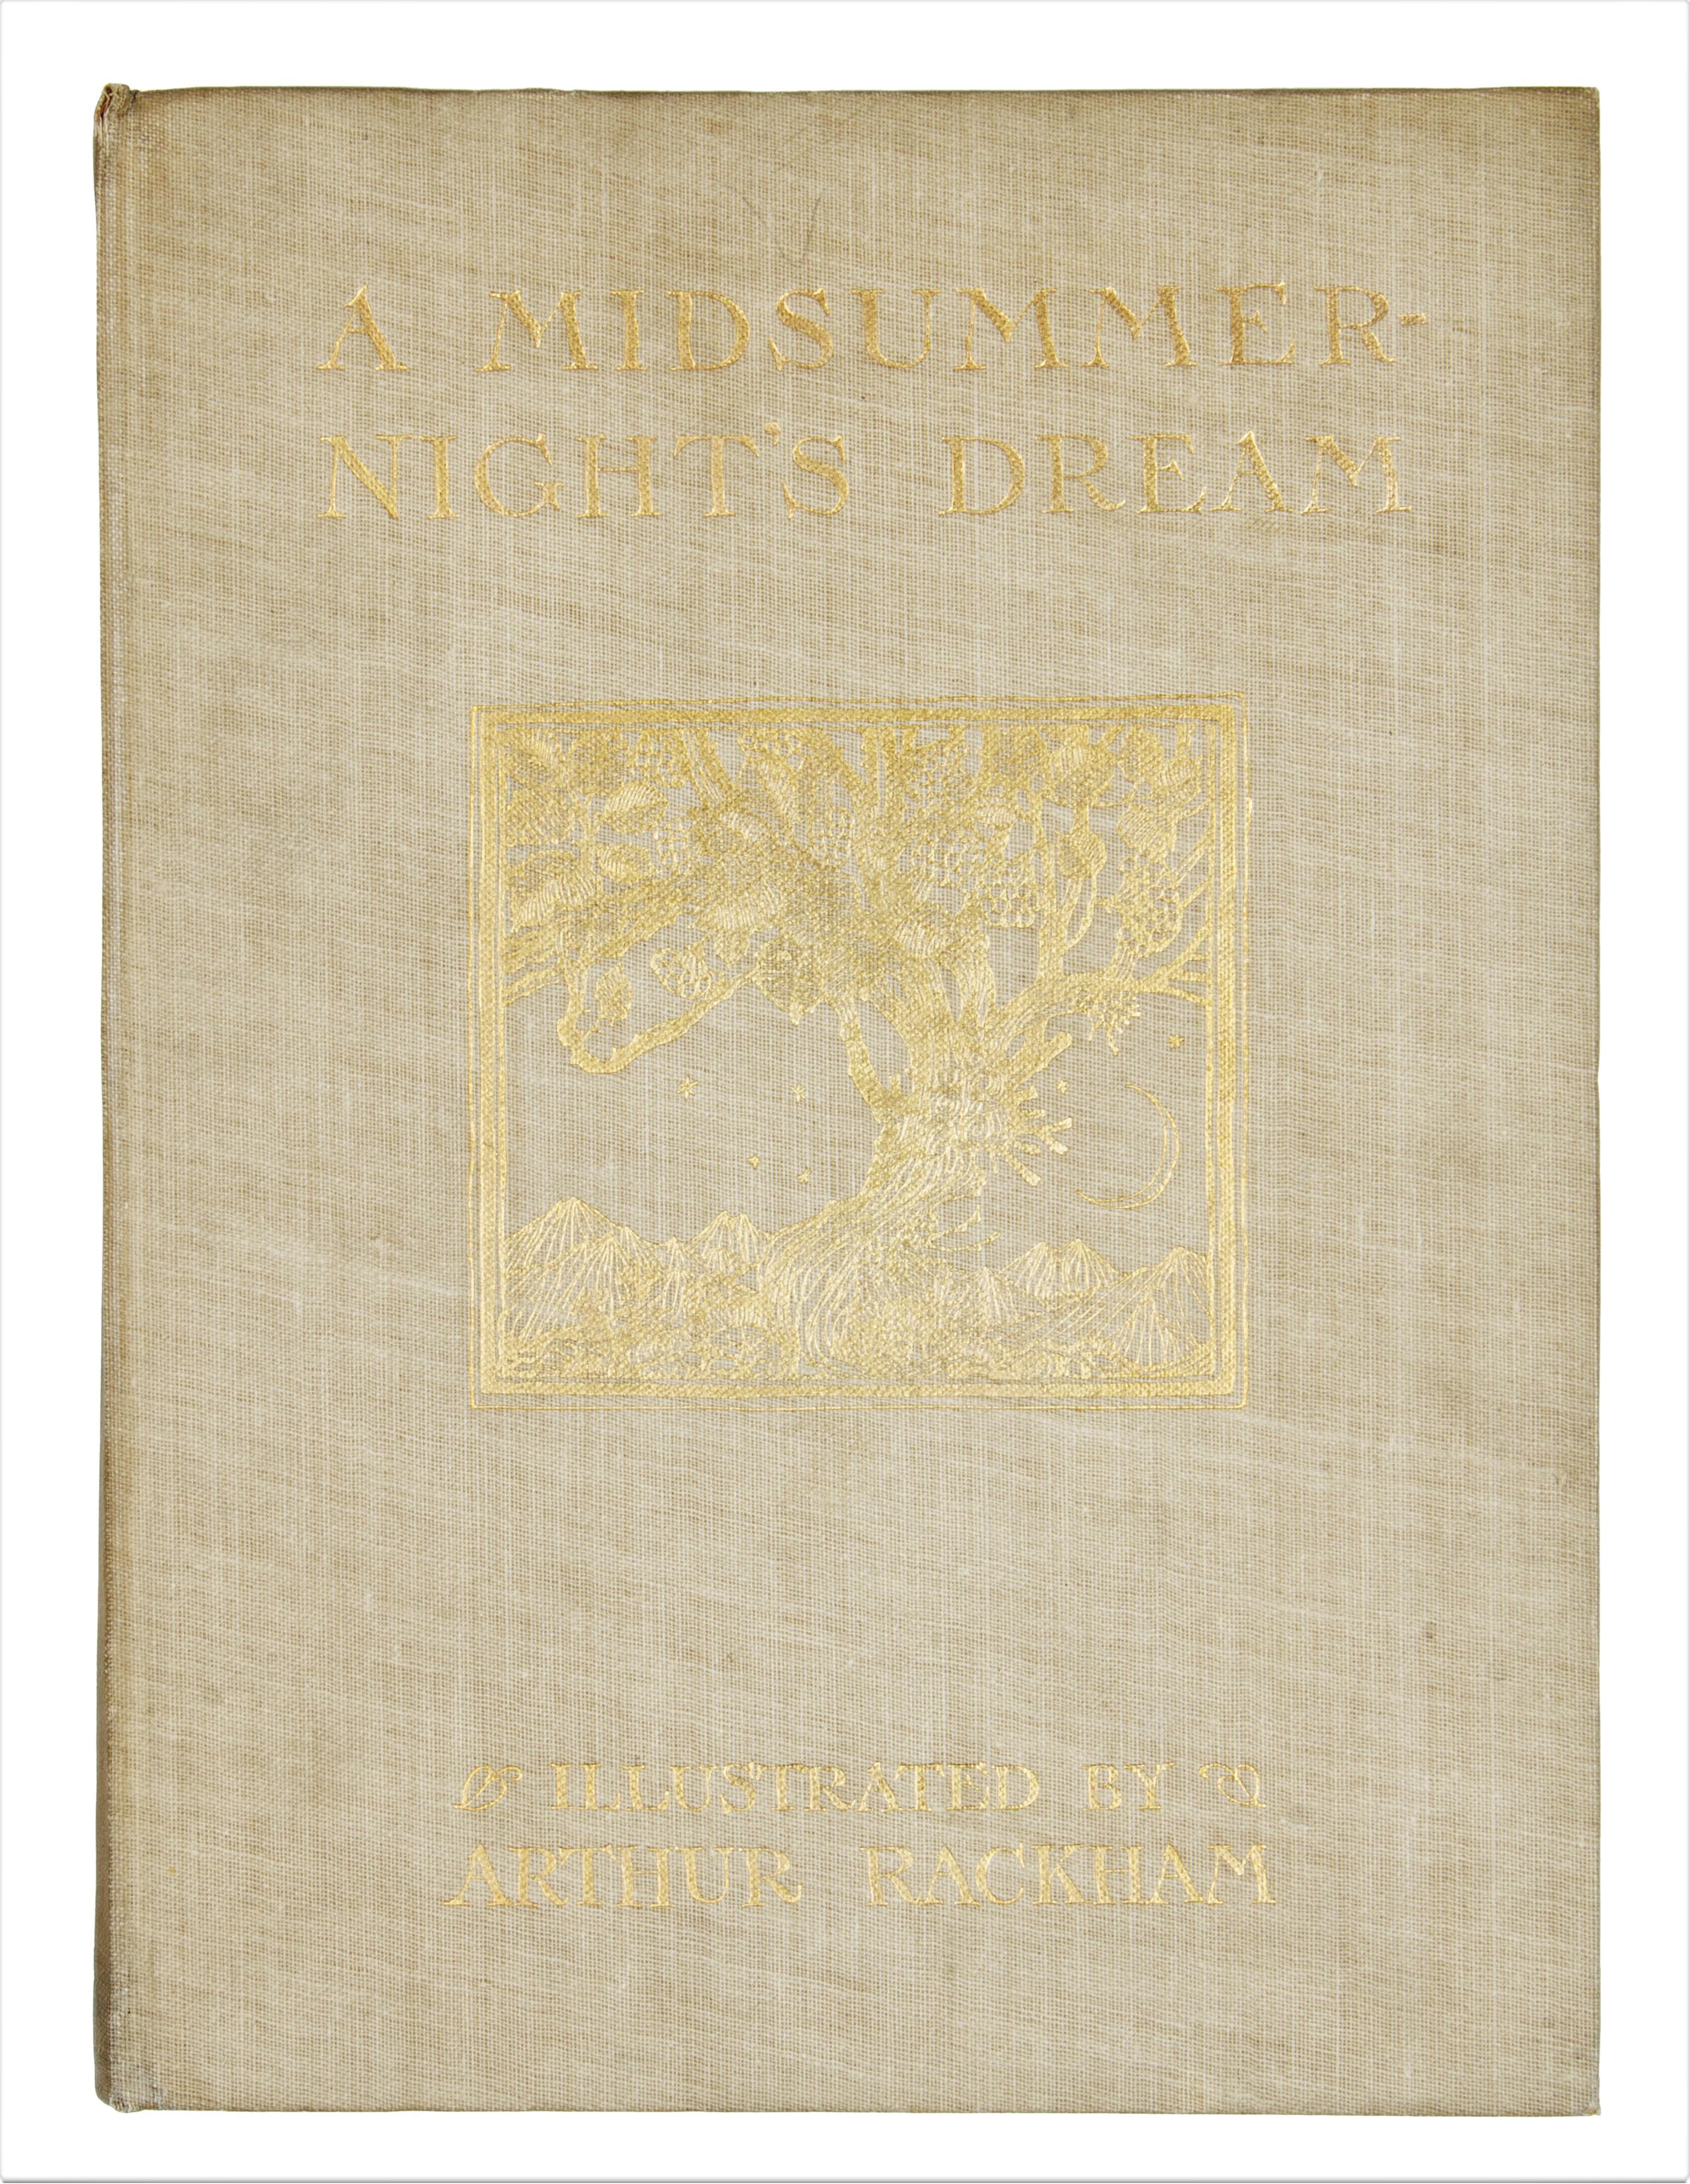 1908 MIDSUMMER NIGHT'S DREAM BY WILLIAM SHAKESPEARE, ILLUSTRATIONS BY ARTHUR RACKHAM